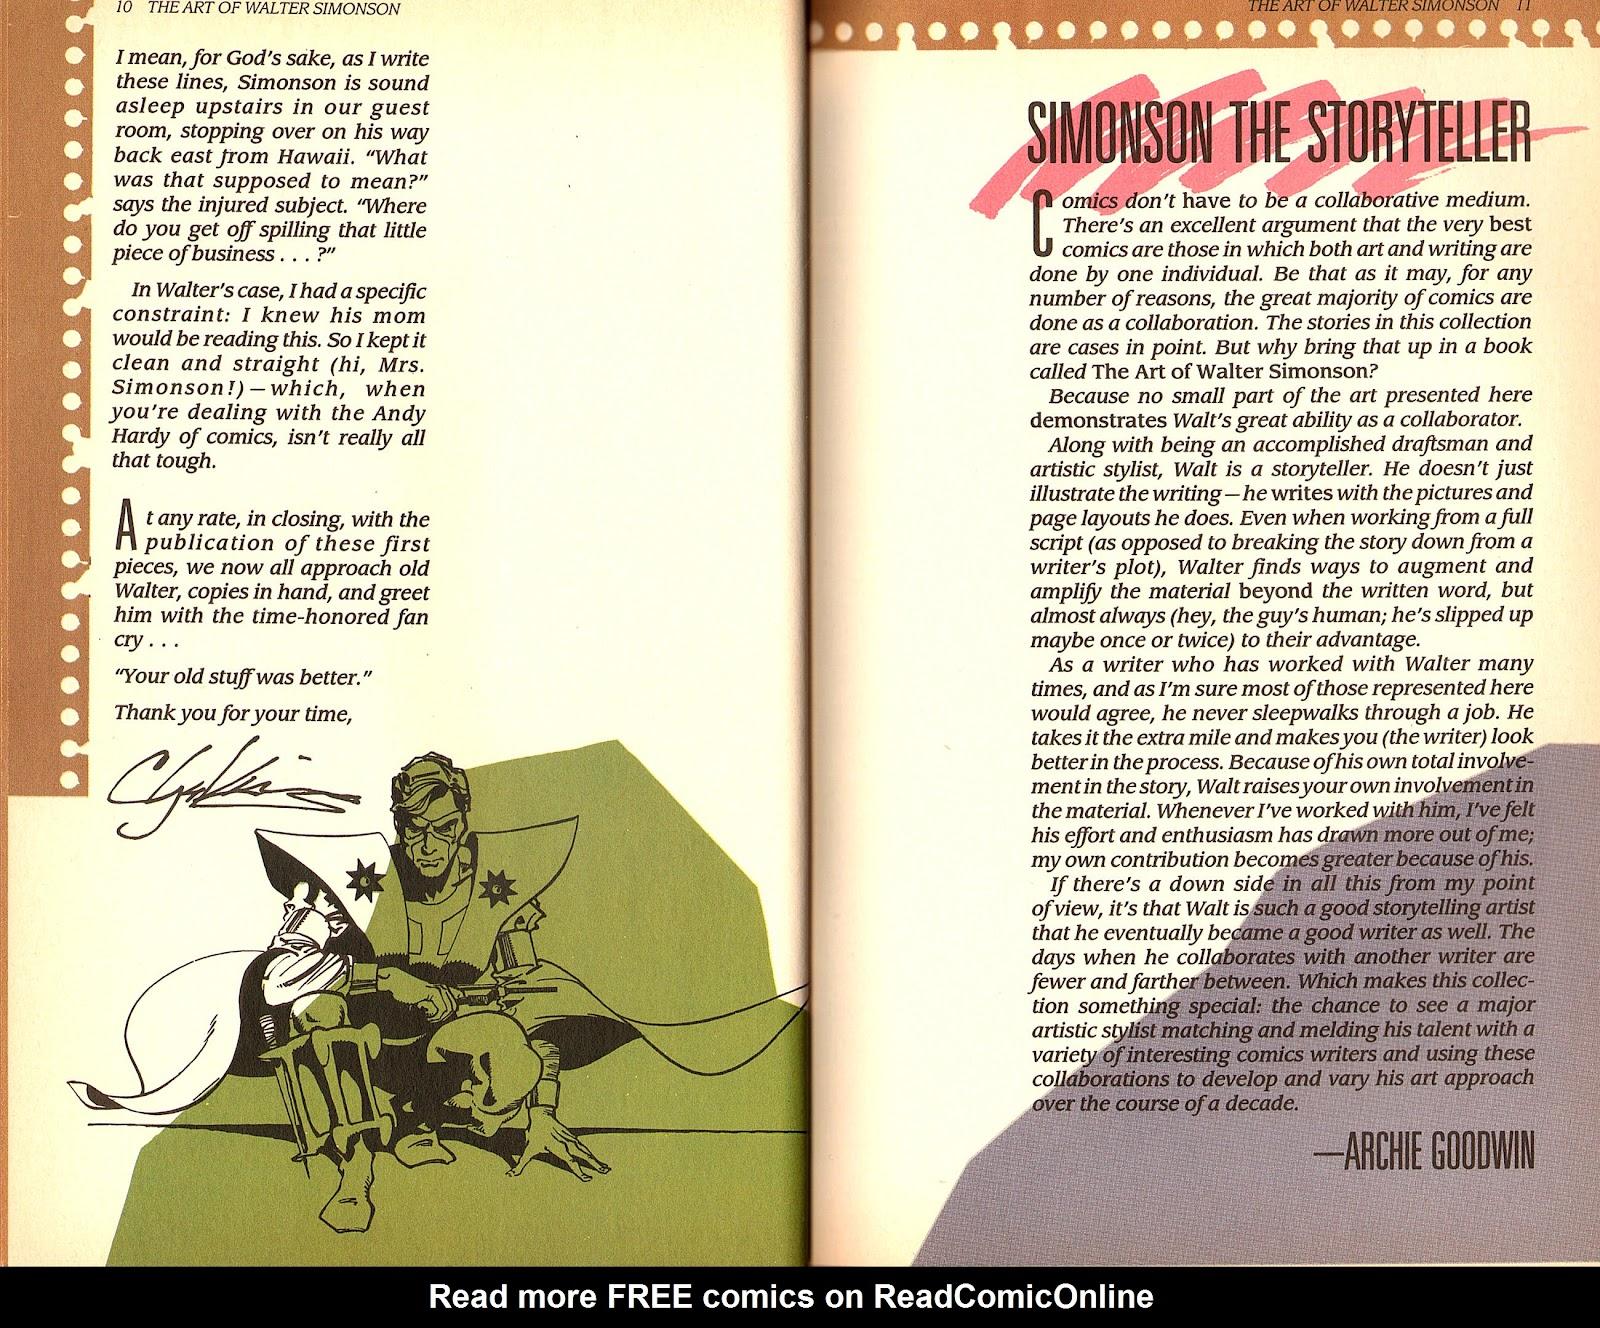 Read online The Art of Walter Simonson comic -  Issue # TPB - 7